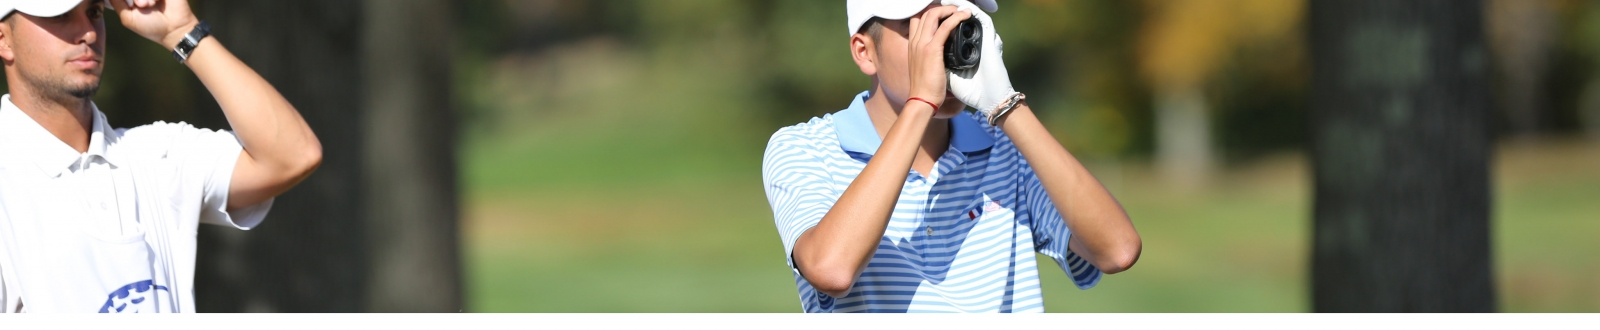 Golfer using range rinder